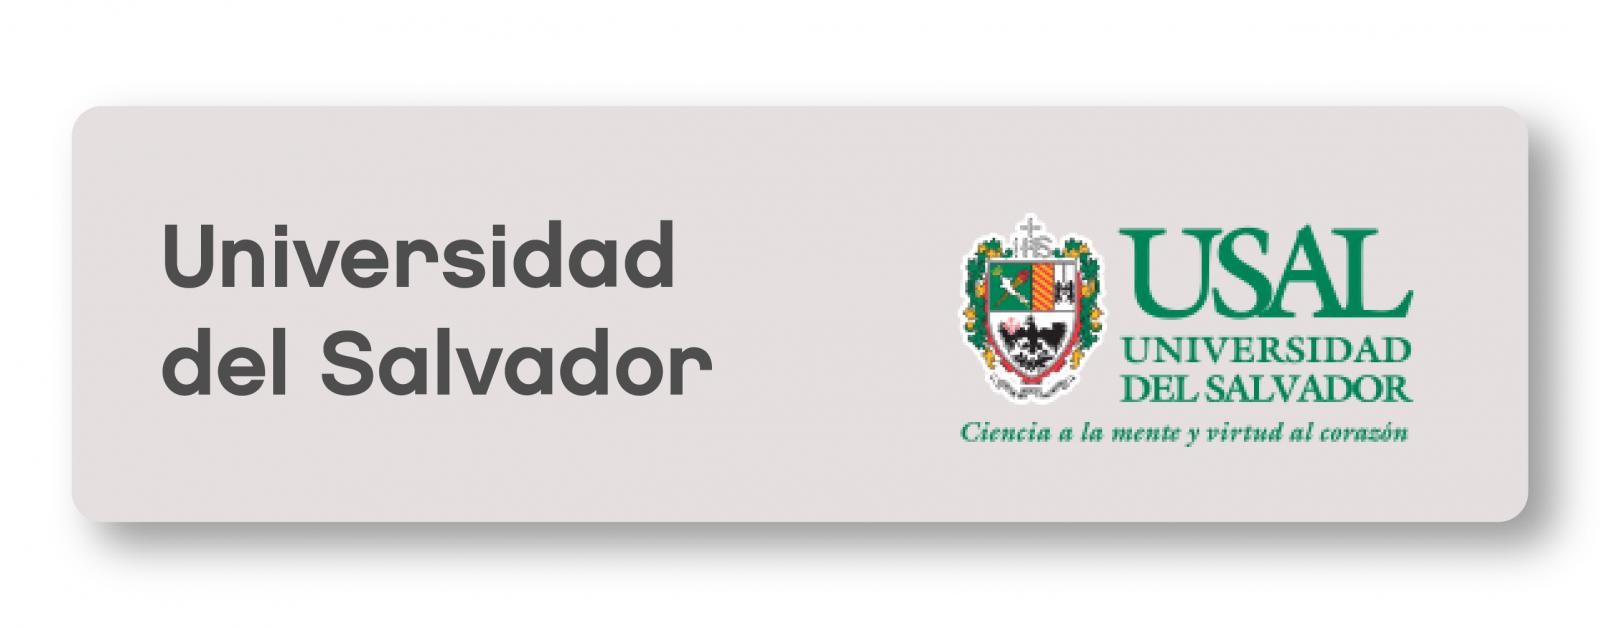 http://study.buenosaires.gob.ar/formularios-ocultos/view/20